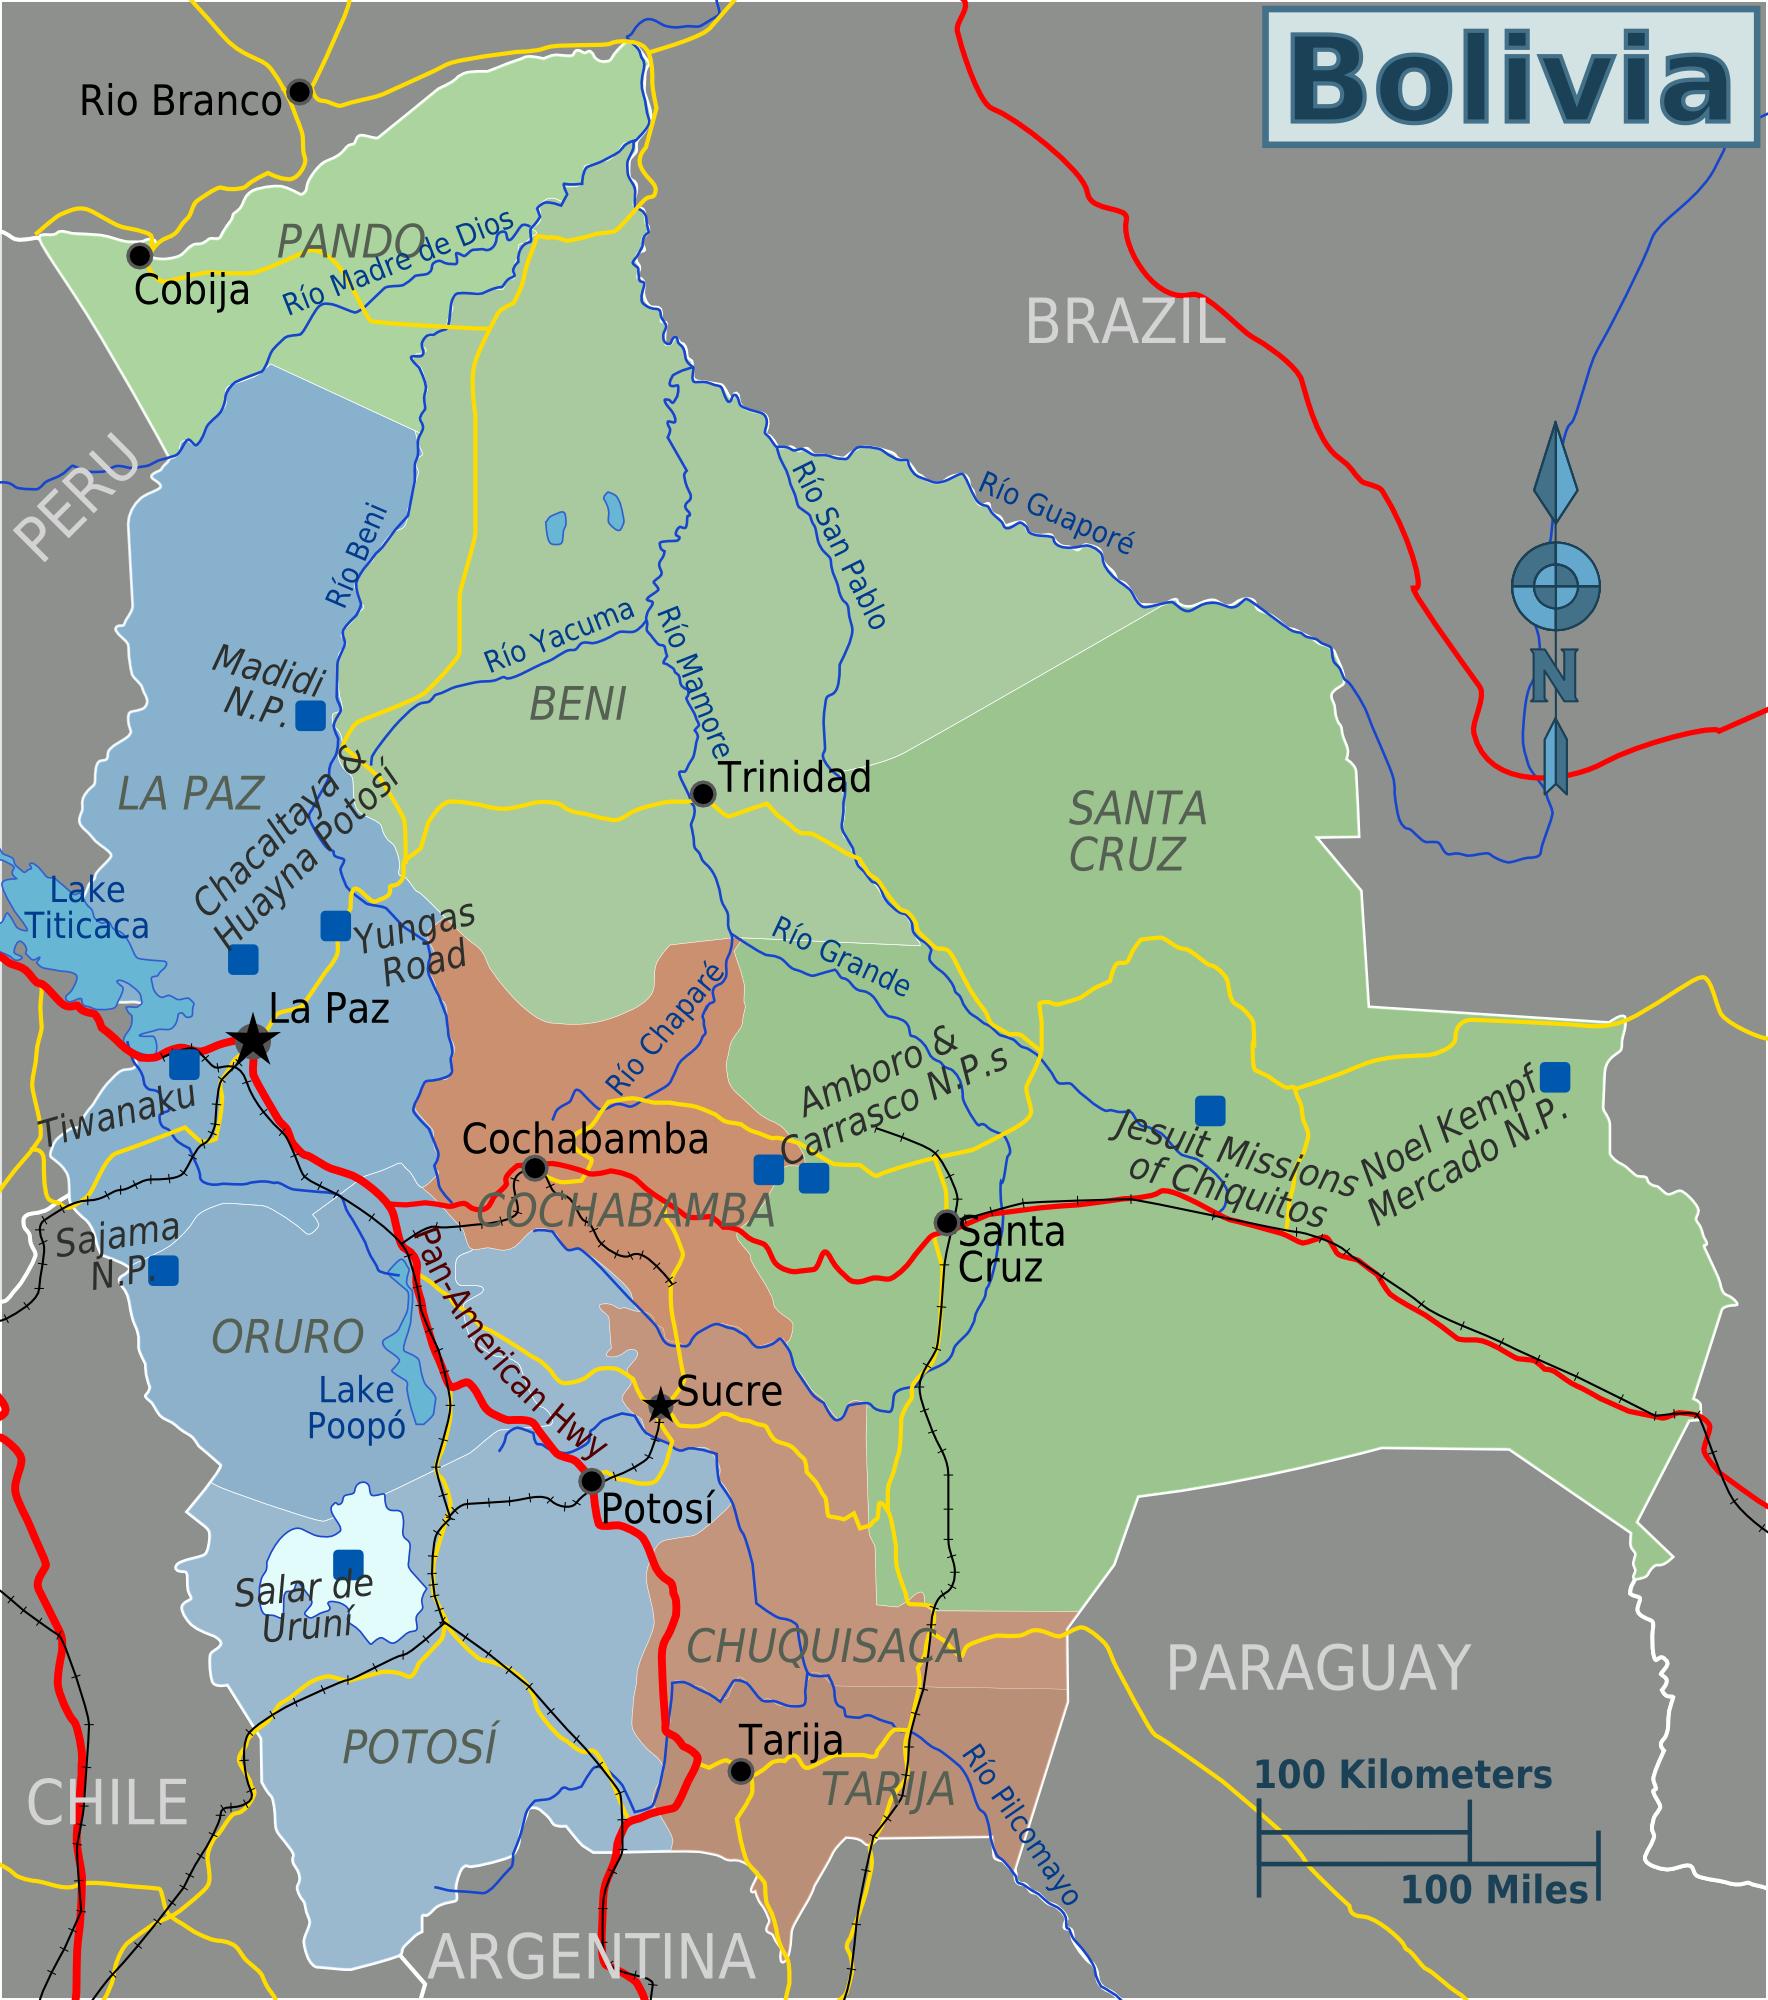 Map of Bolivia (Regions) : Worldofmaps.net - online Maps and Travel ...